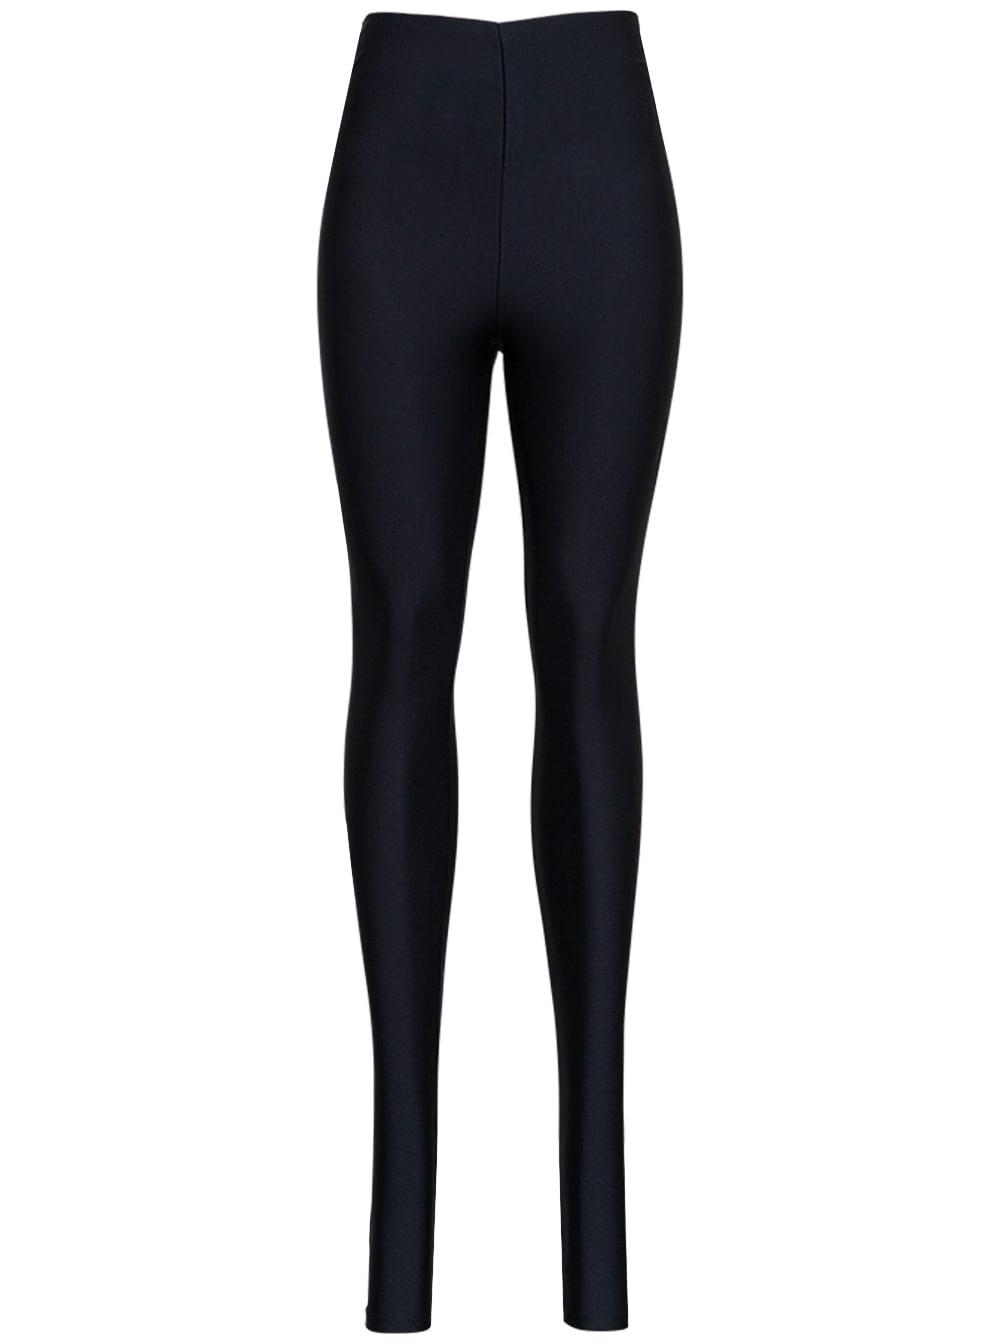 Black Holly Leggings In Shiny Stretch Fabric